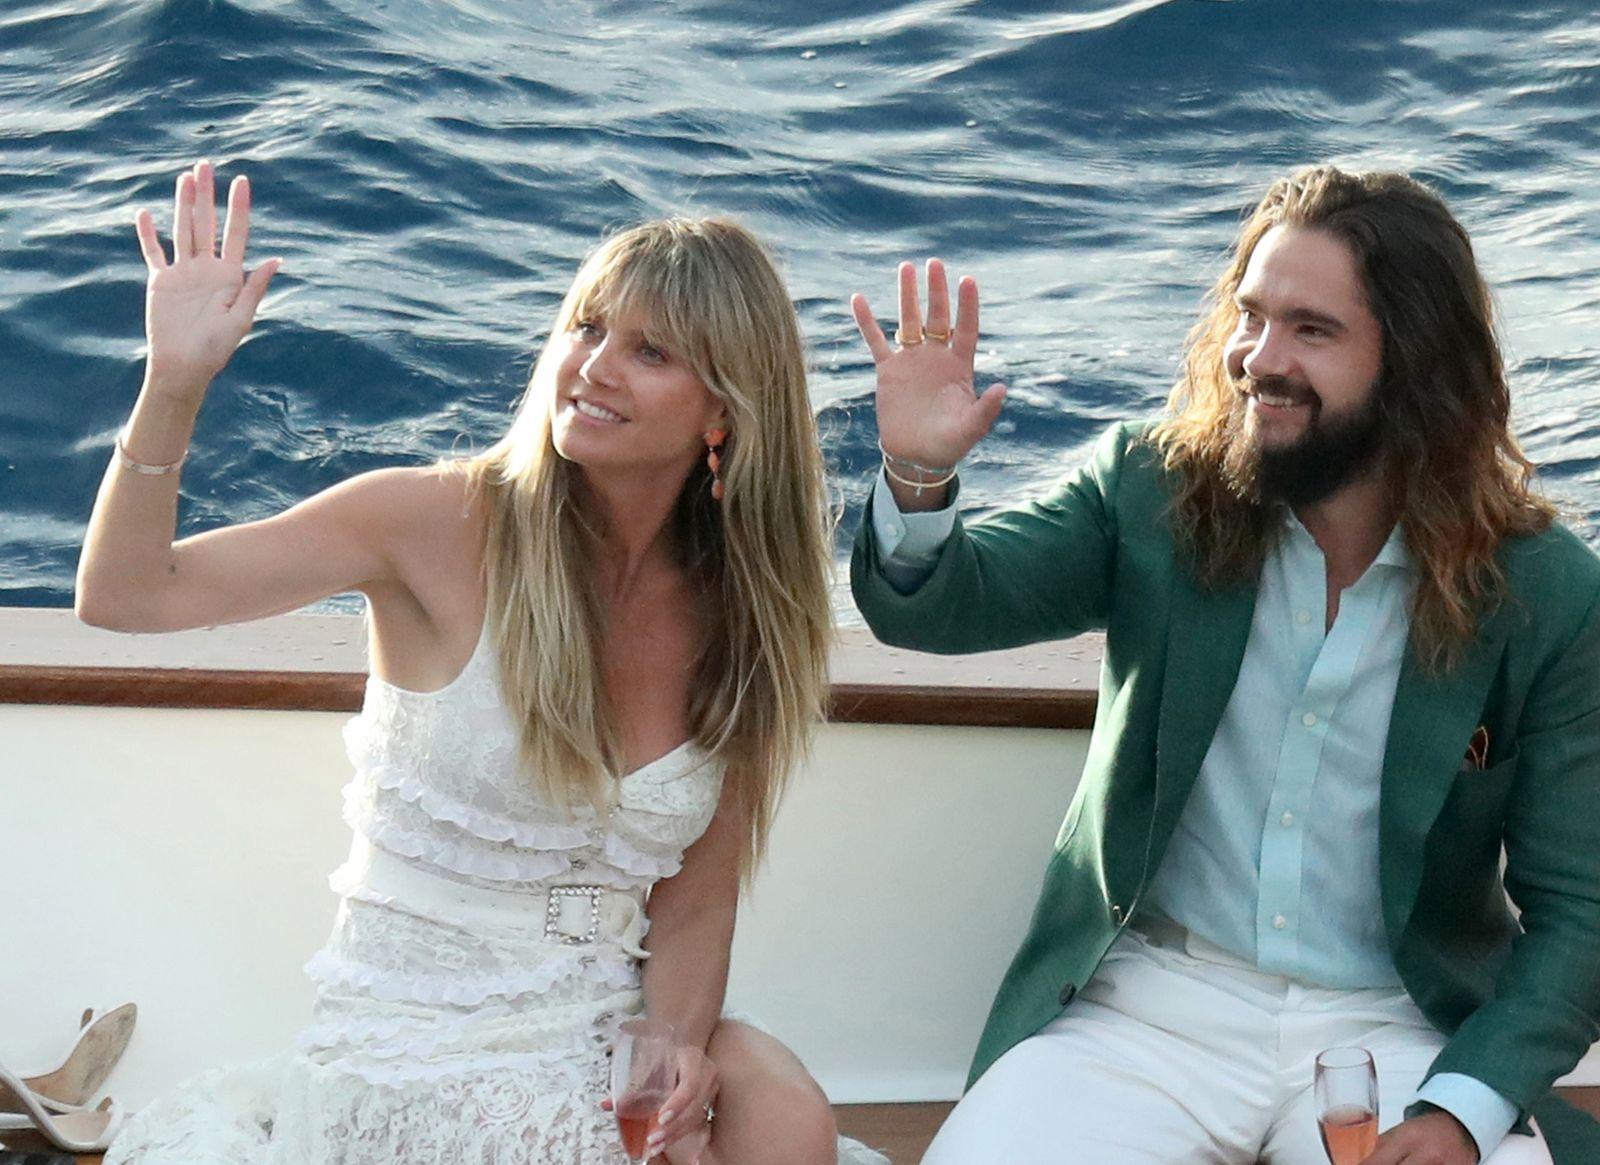 Jahresrückblick 2019 - Heidi Klum und Tom Kaulitz